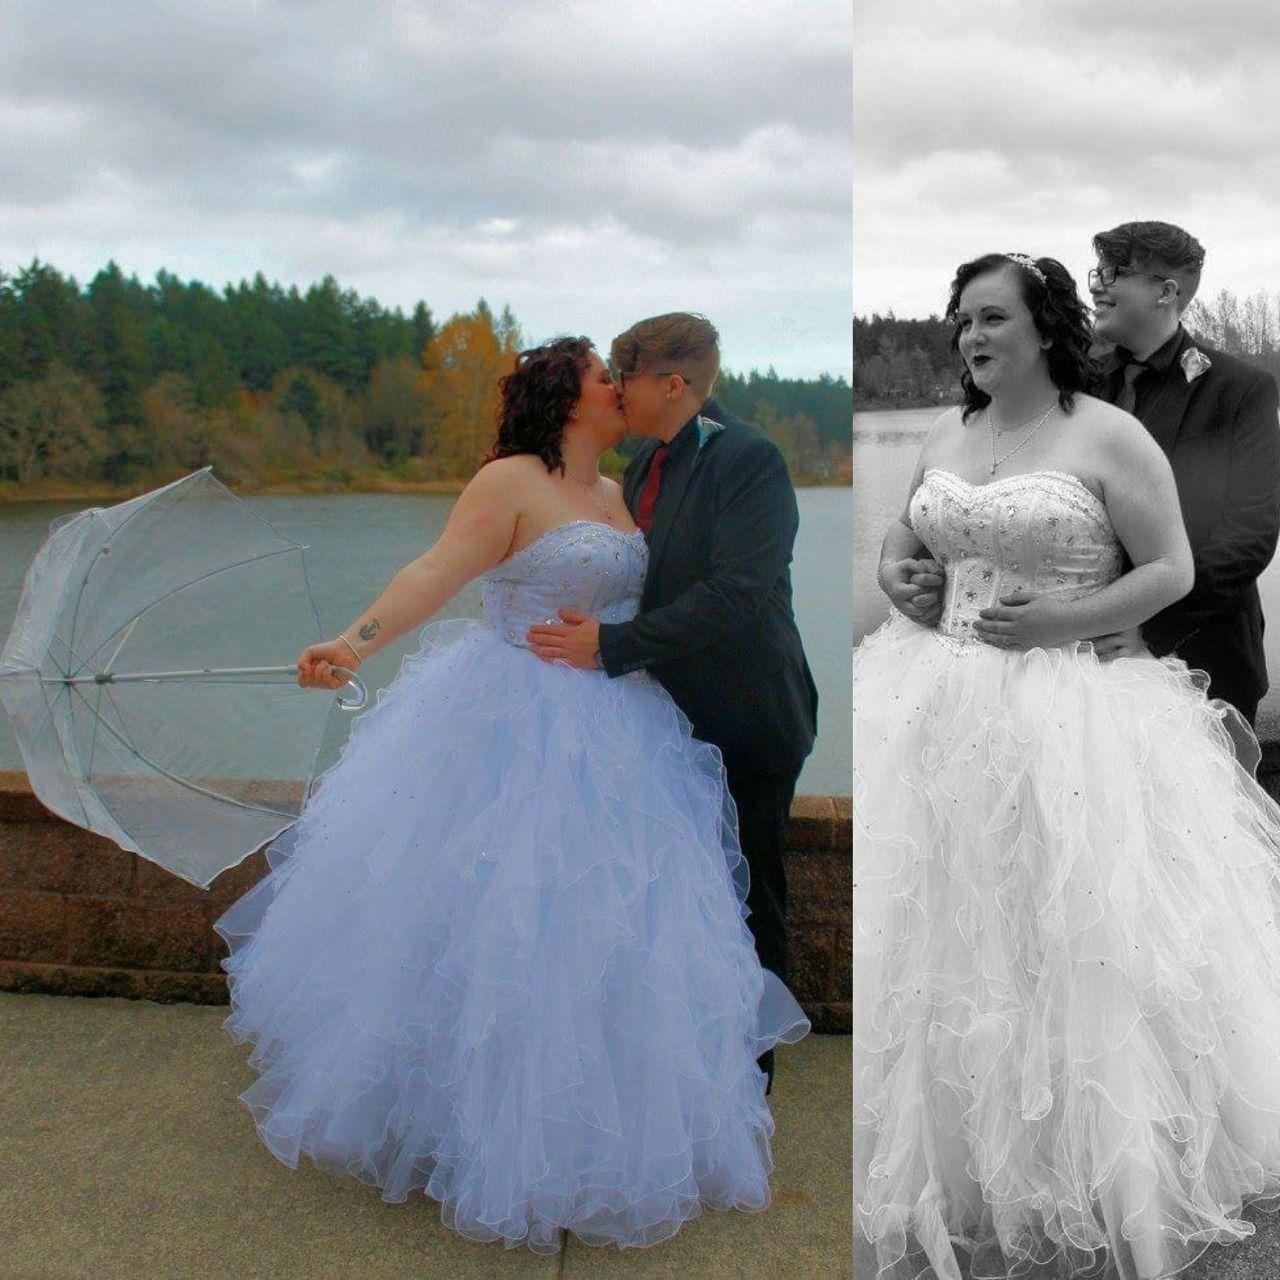 The day I married my best friend! Wedding date November 12, 2016 ...